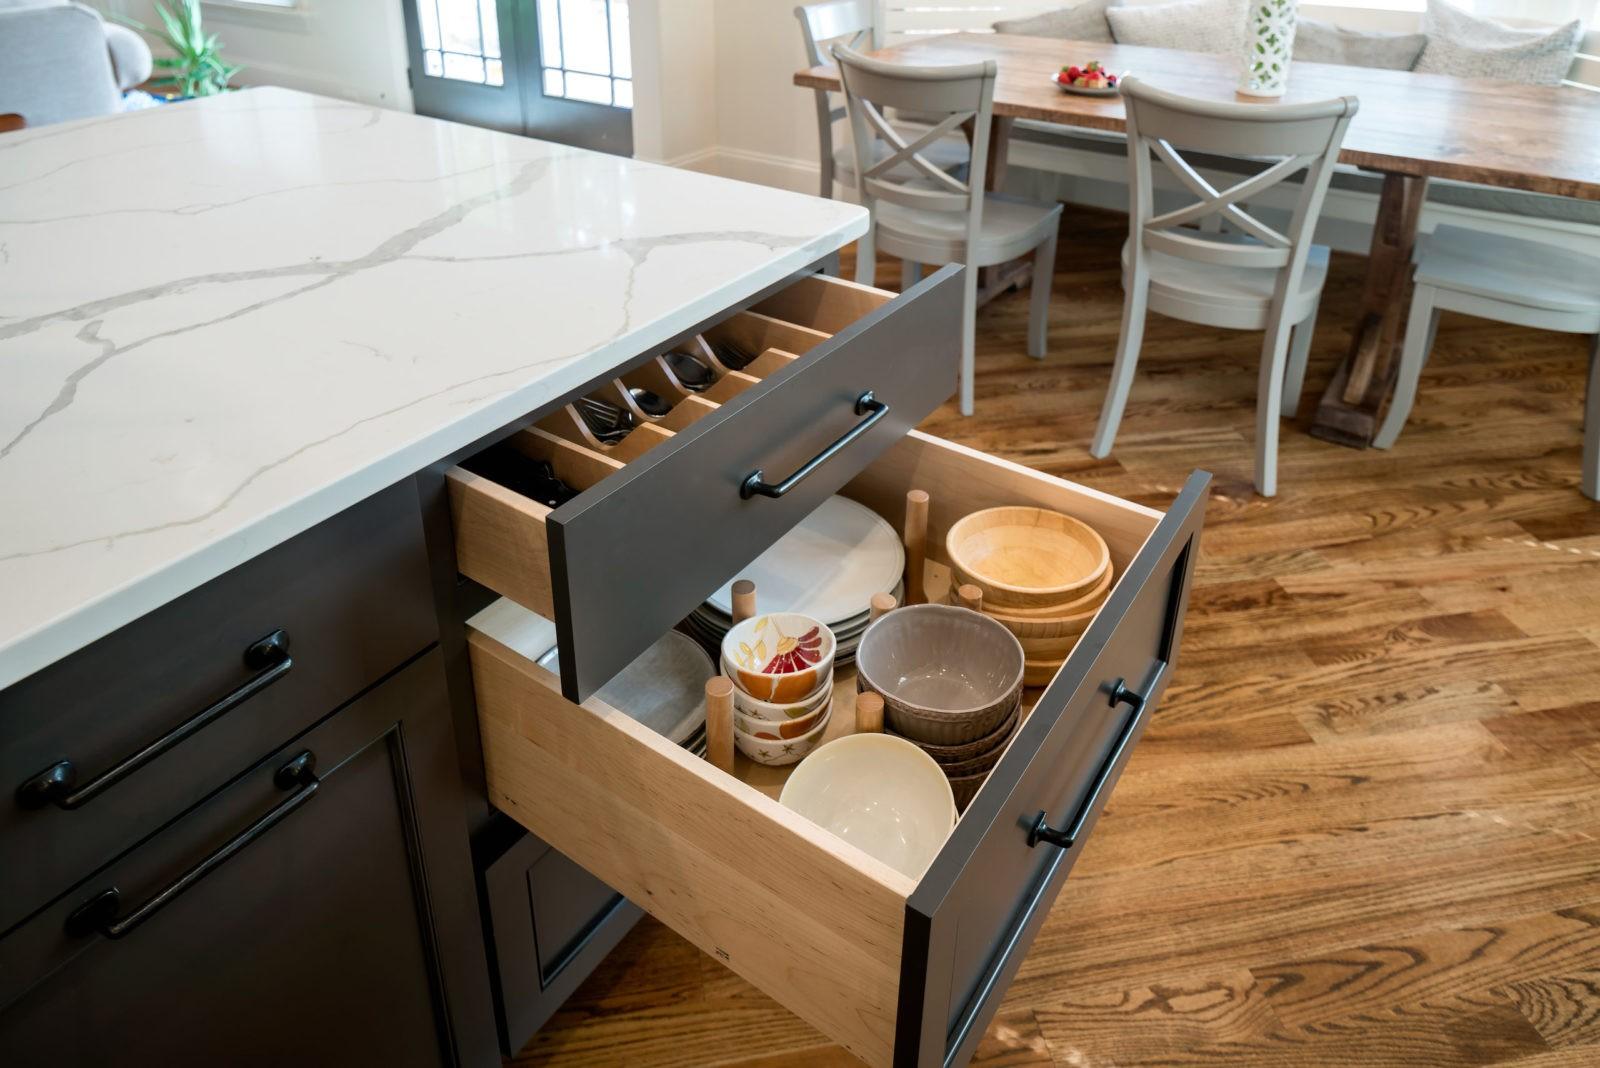 farmhouse-style-kitchen-kitchen-drawer-peg-system